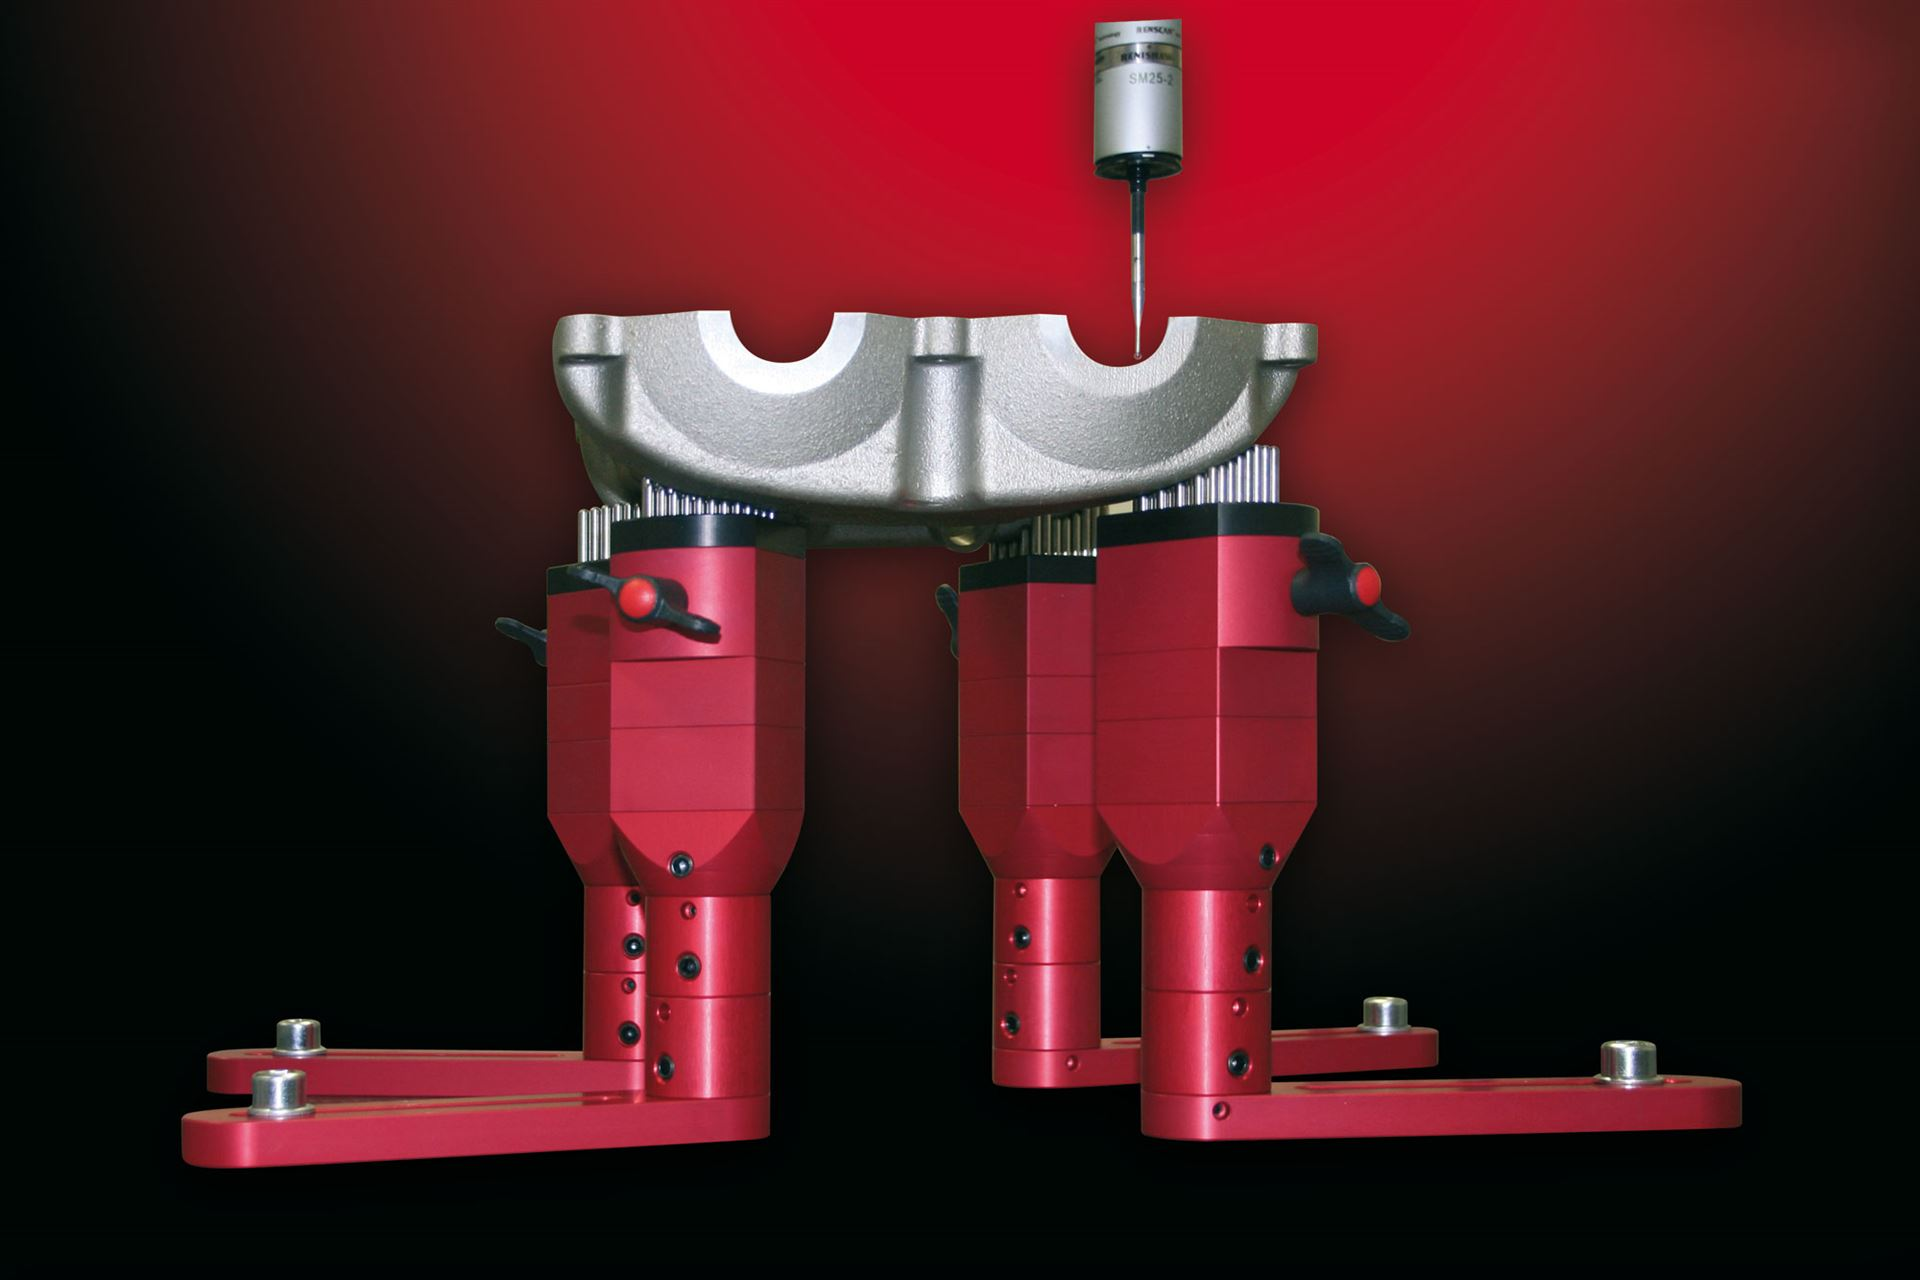 pintec modular clamping system in use